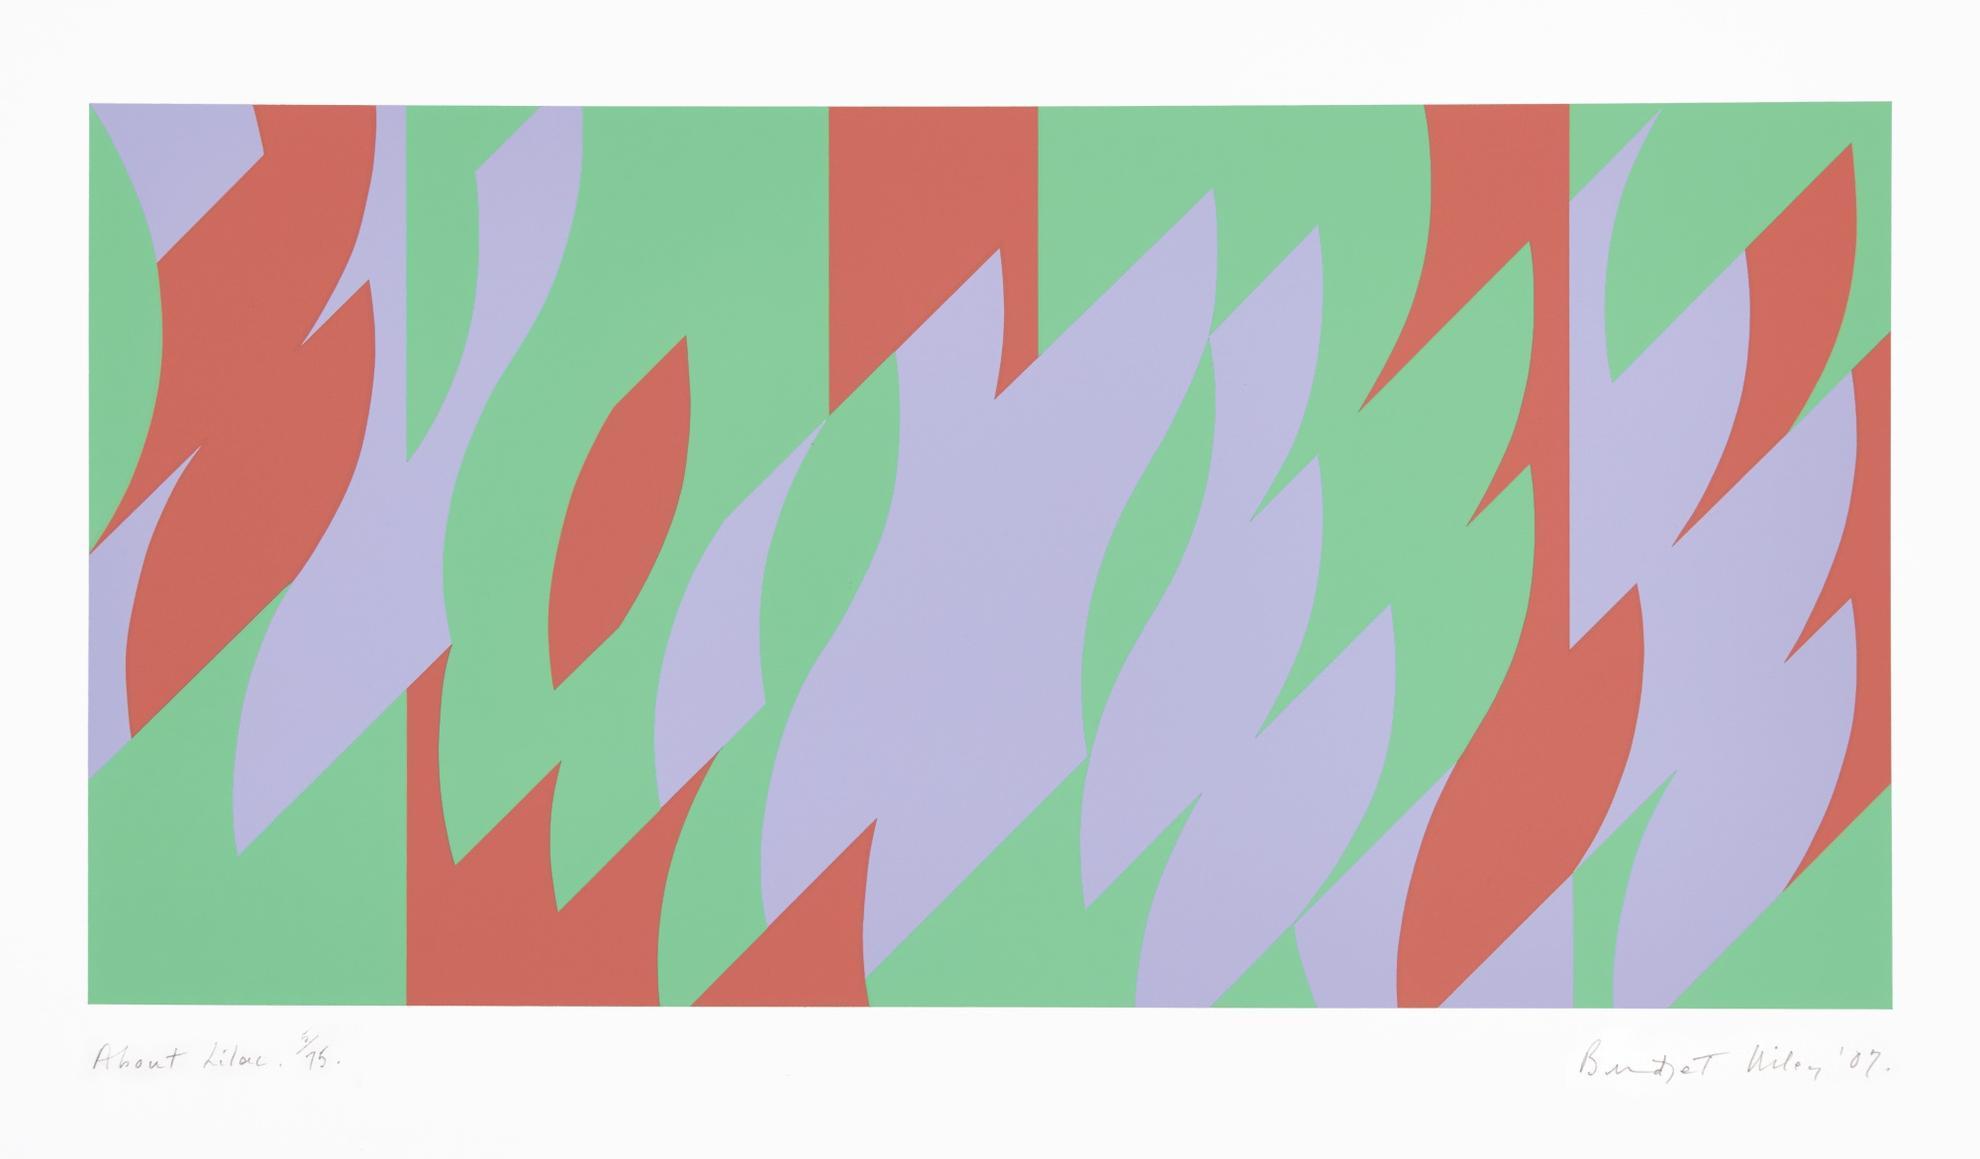 Bridget Riley-About Lilac (S. 65)-2007